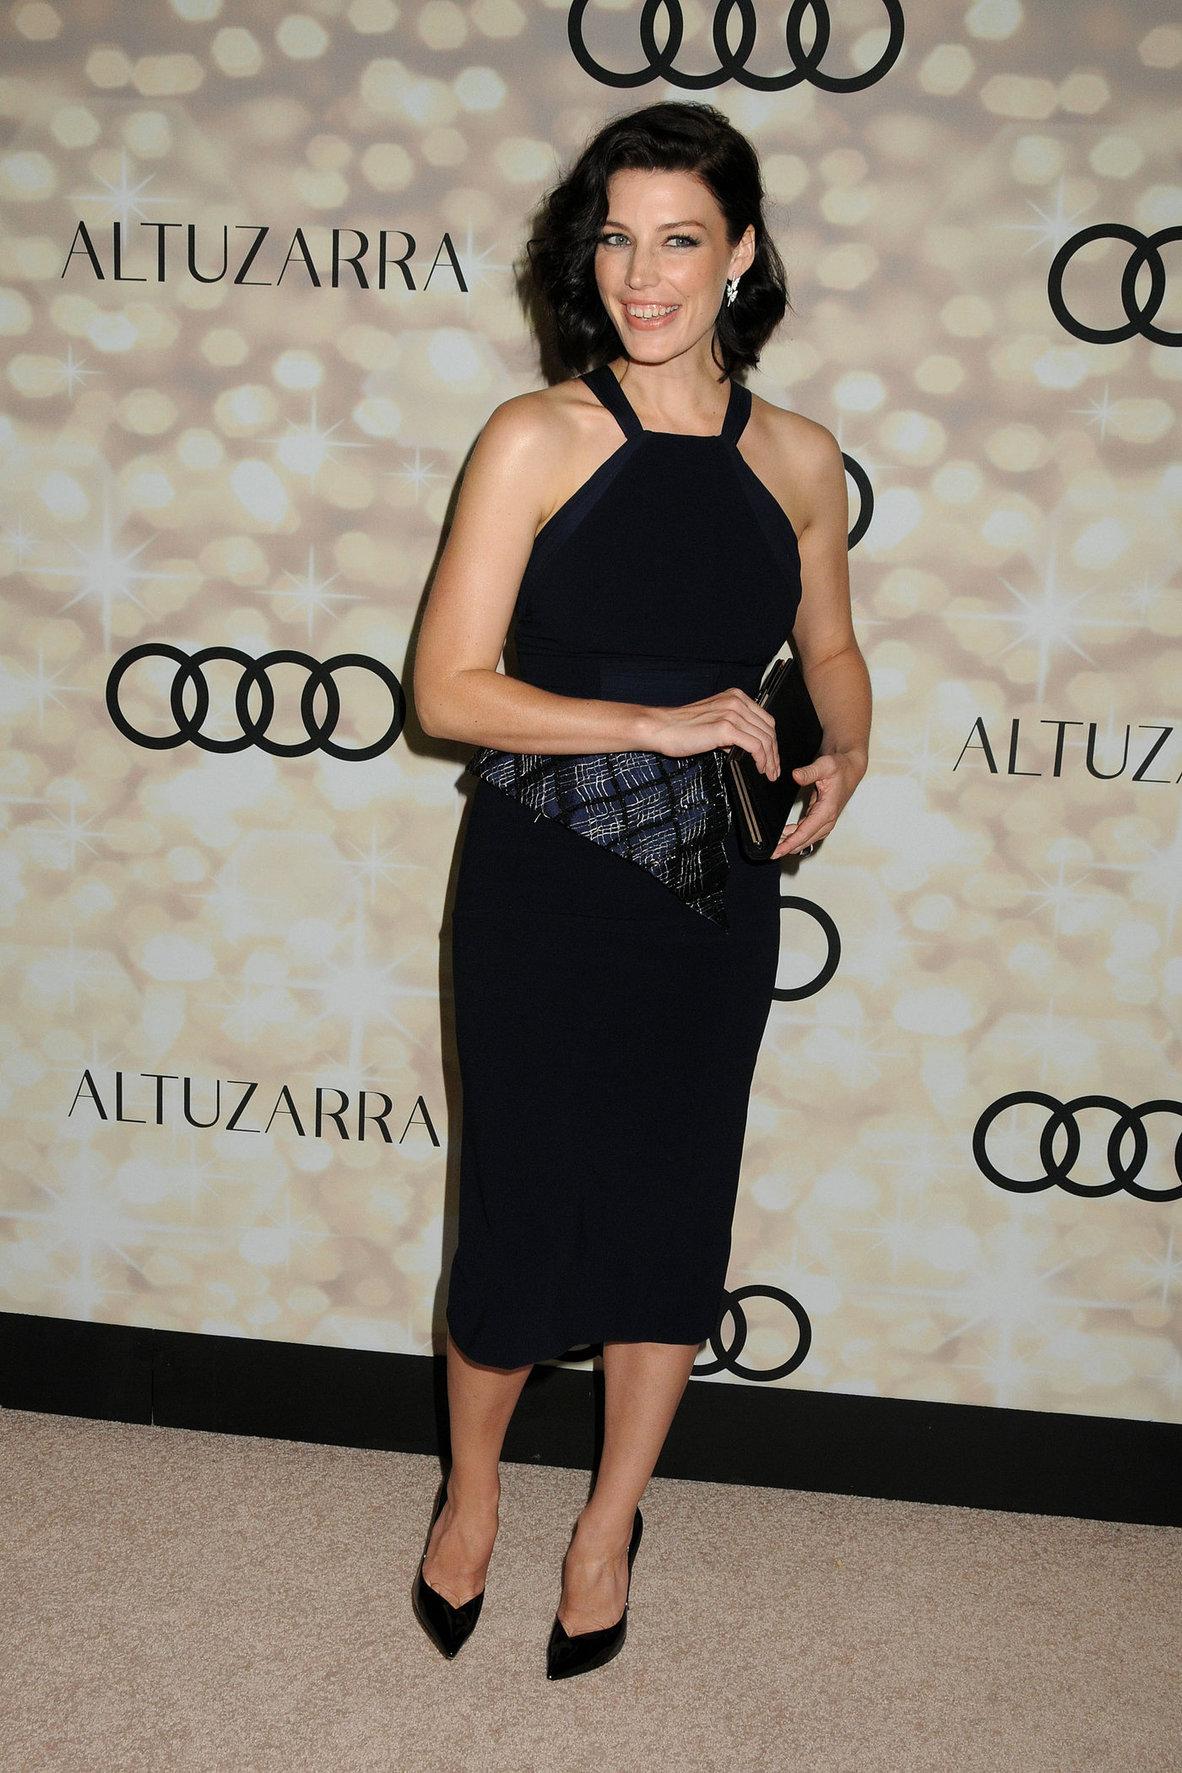 Jessica Pare Audi & Altuzarra Emmys Week 2013 Kick-Off Party in Los Angeles, Sep. 15, 2013